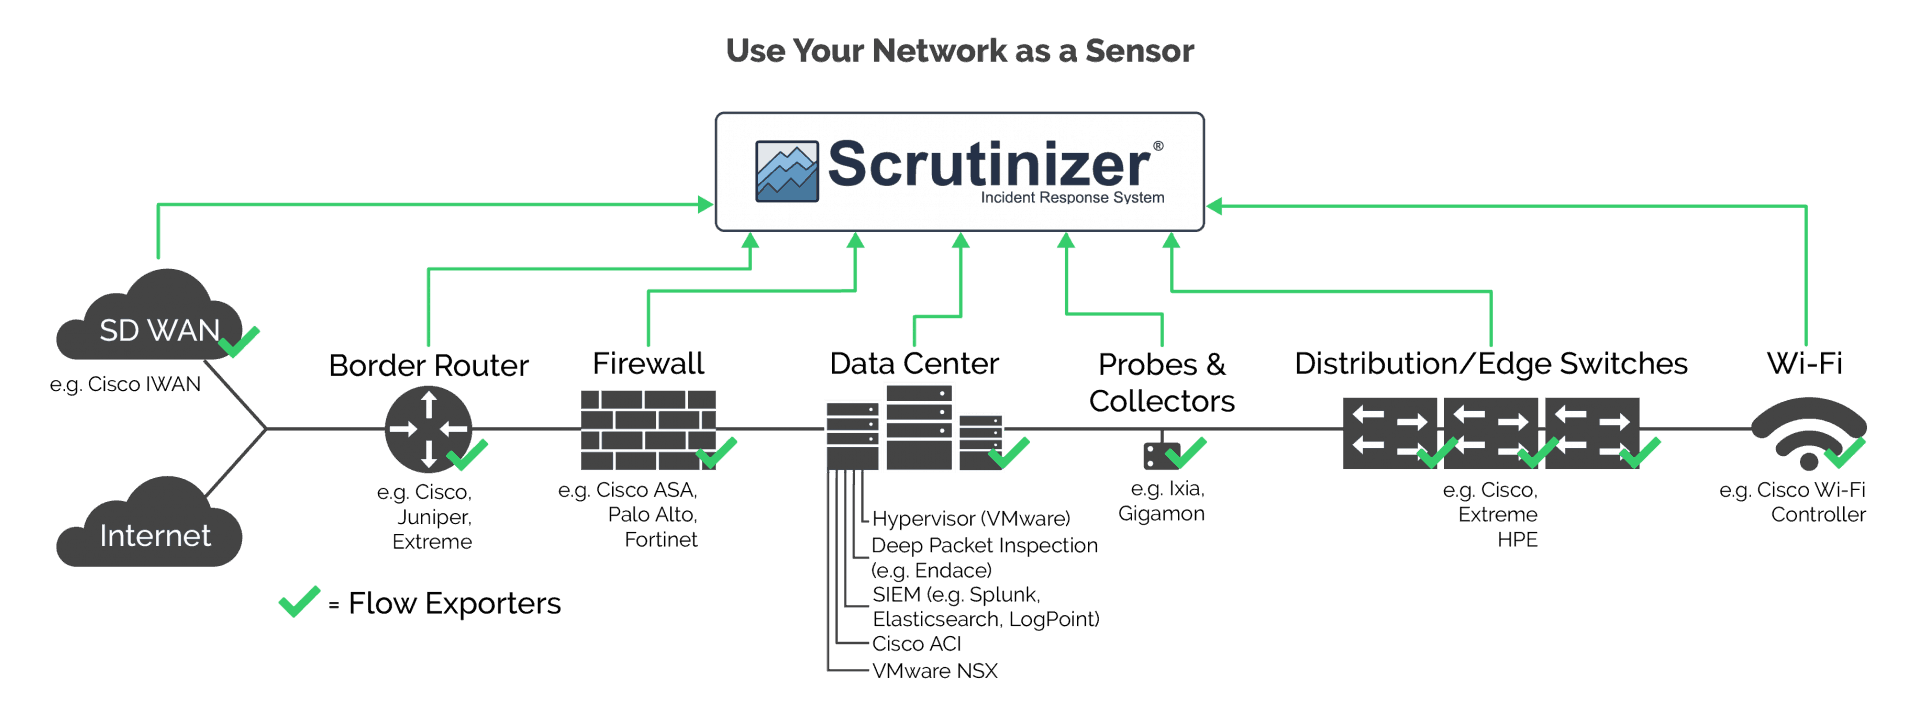 Scrutinizer Diagram